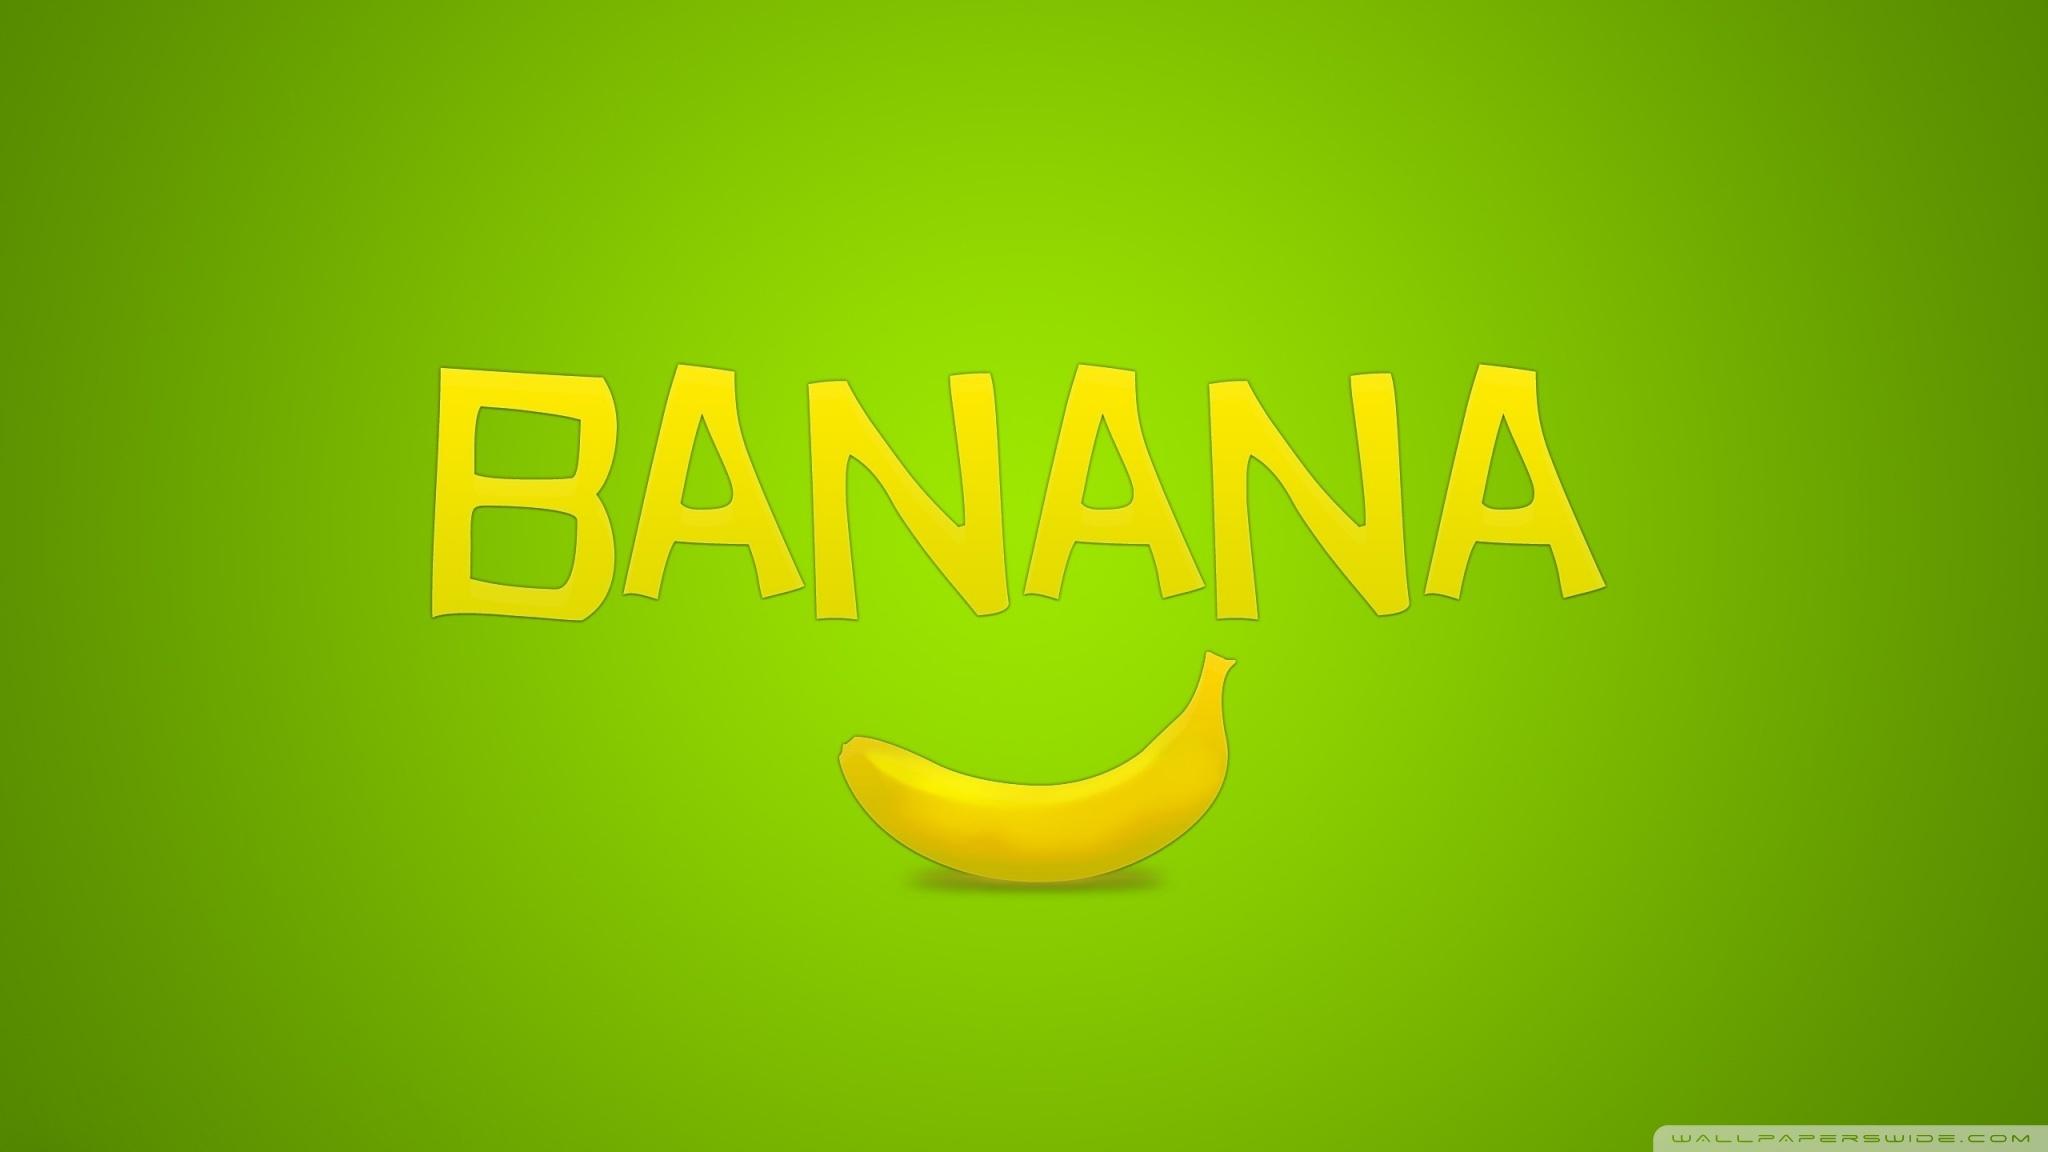 Dual Monitor Animated Wallpaper Banana 4k Hd Desktop Wallpaper For 4k Ultra Hd Tv Dual